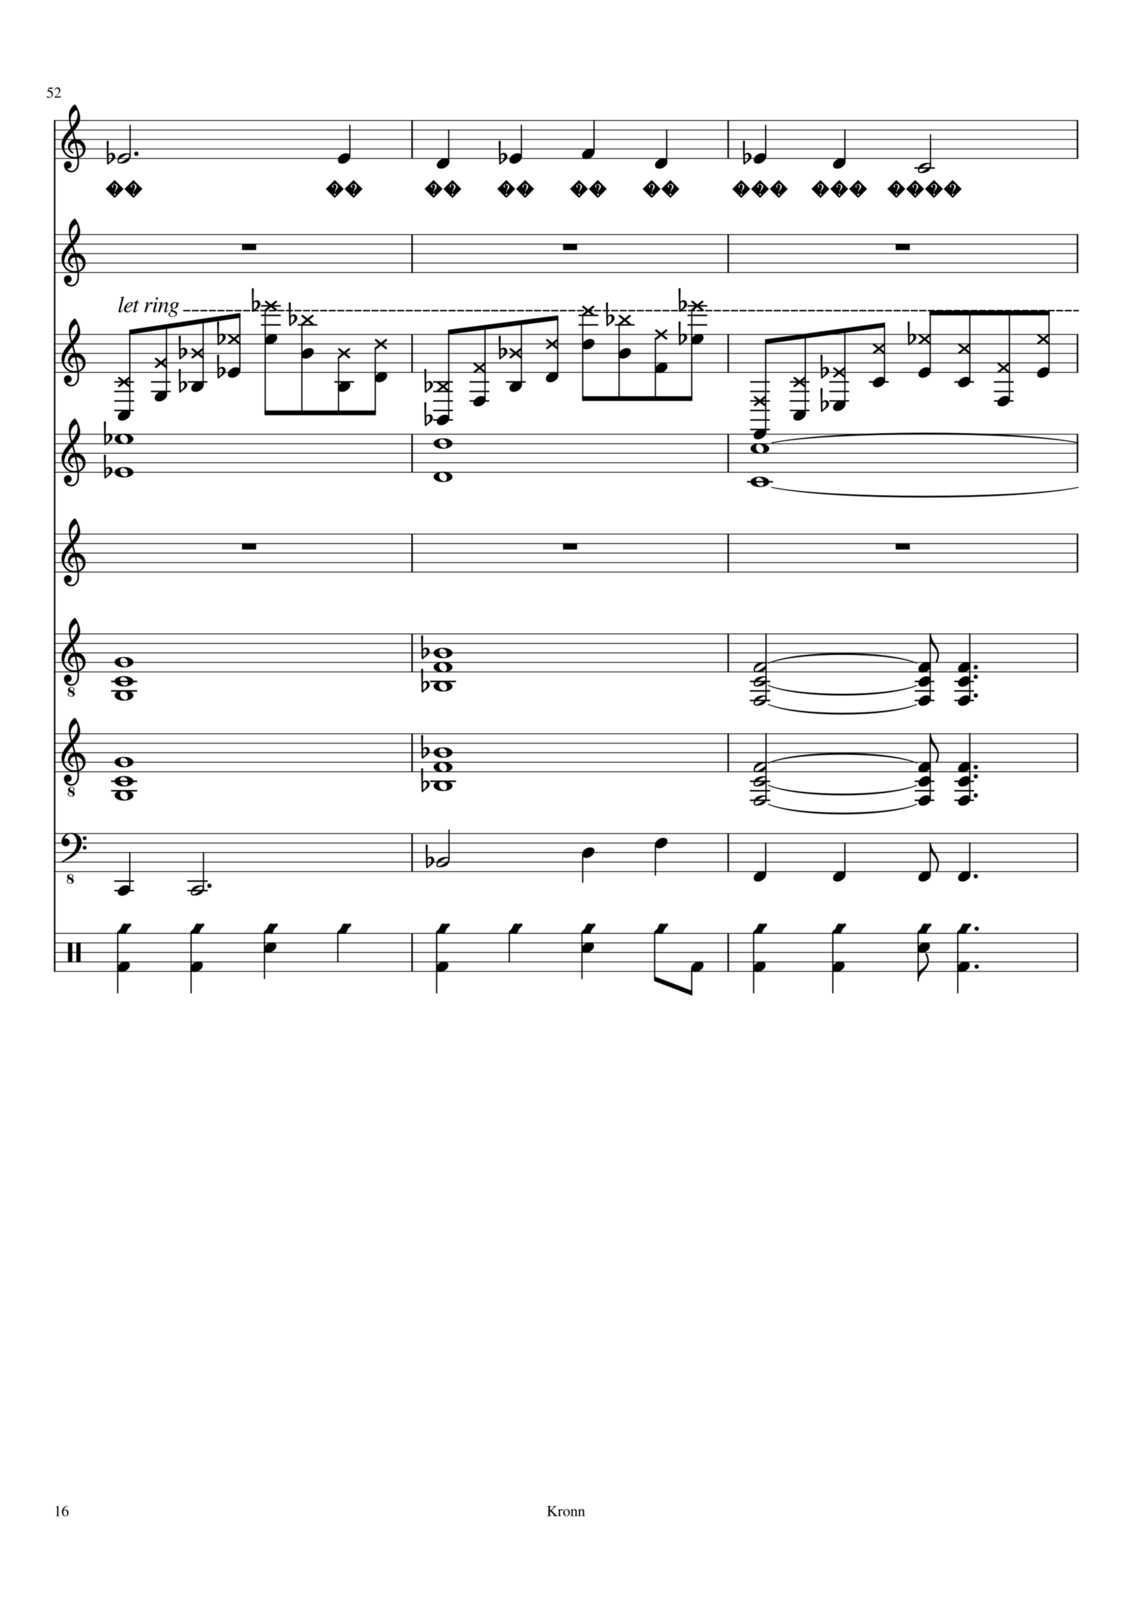 Okean Pustotyi slide, Image 16